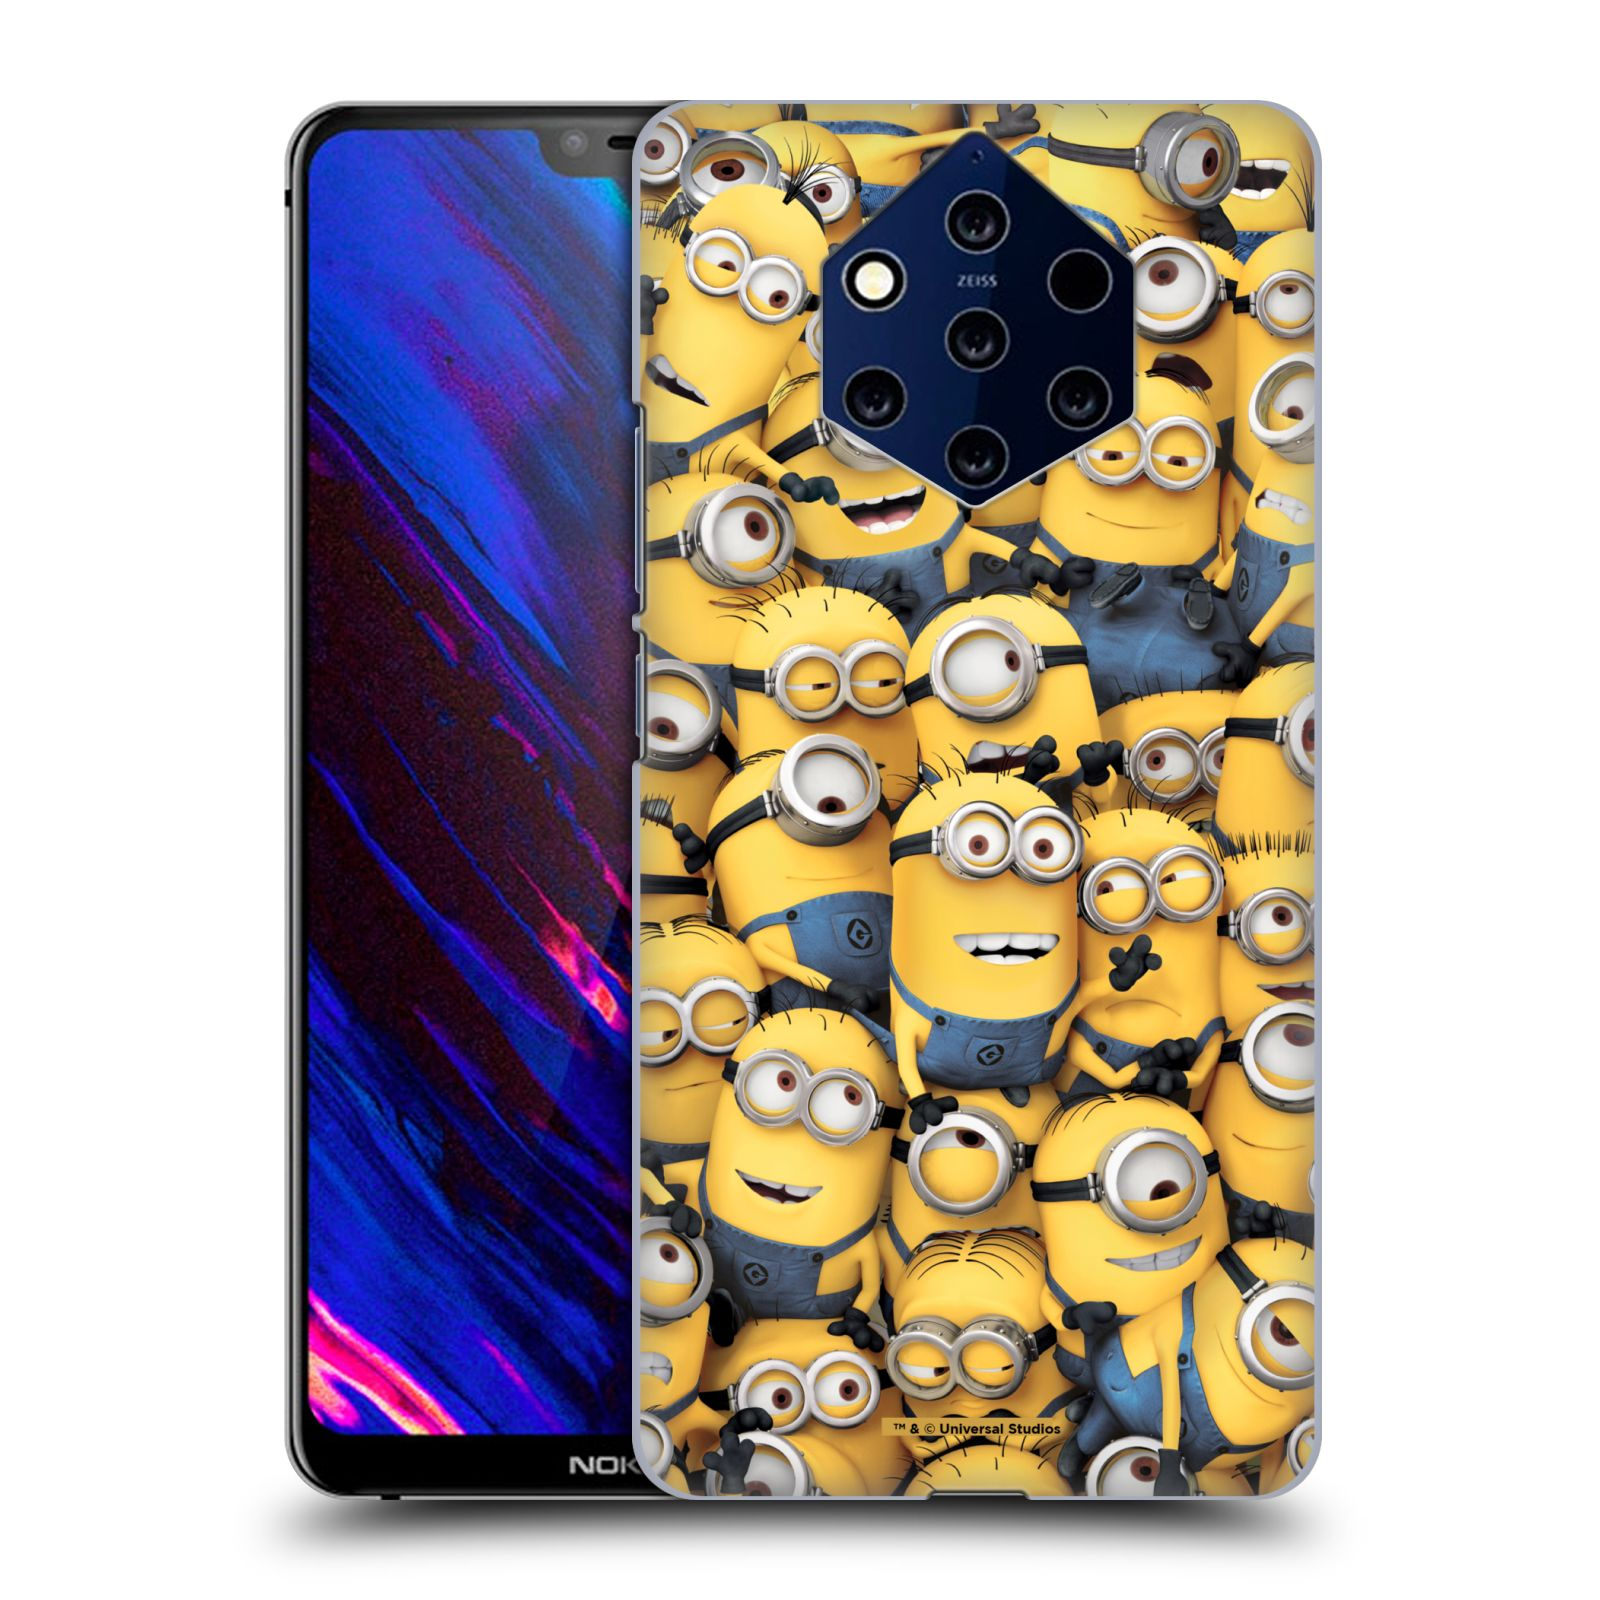 Plastové pouzdro na mobil Nokia 9 PureView - Head Case - Mimoni všude z filmu Já, padouch - Despicable Me